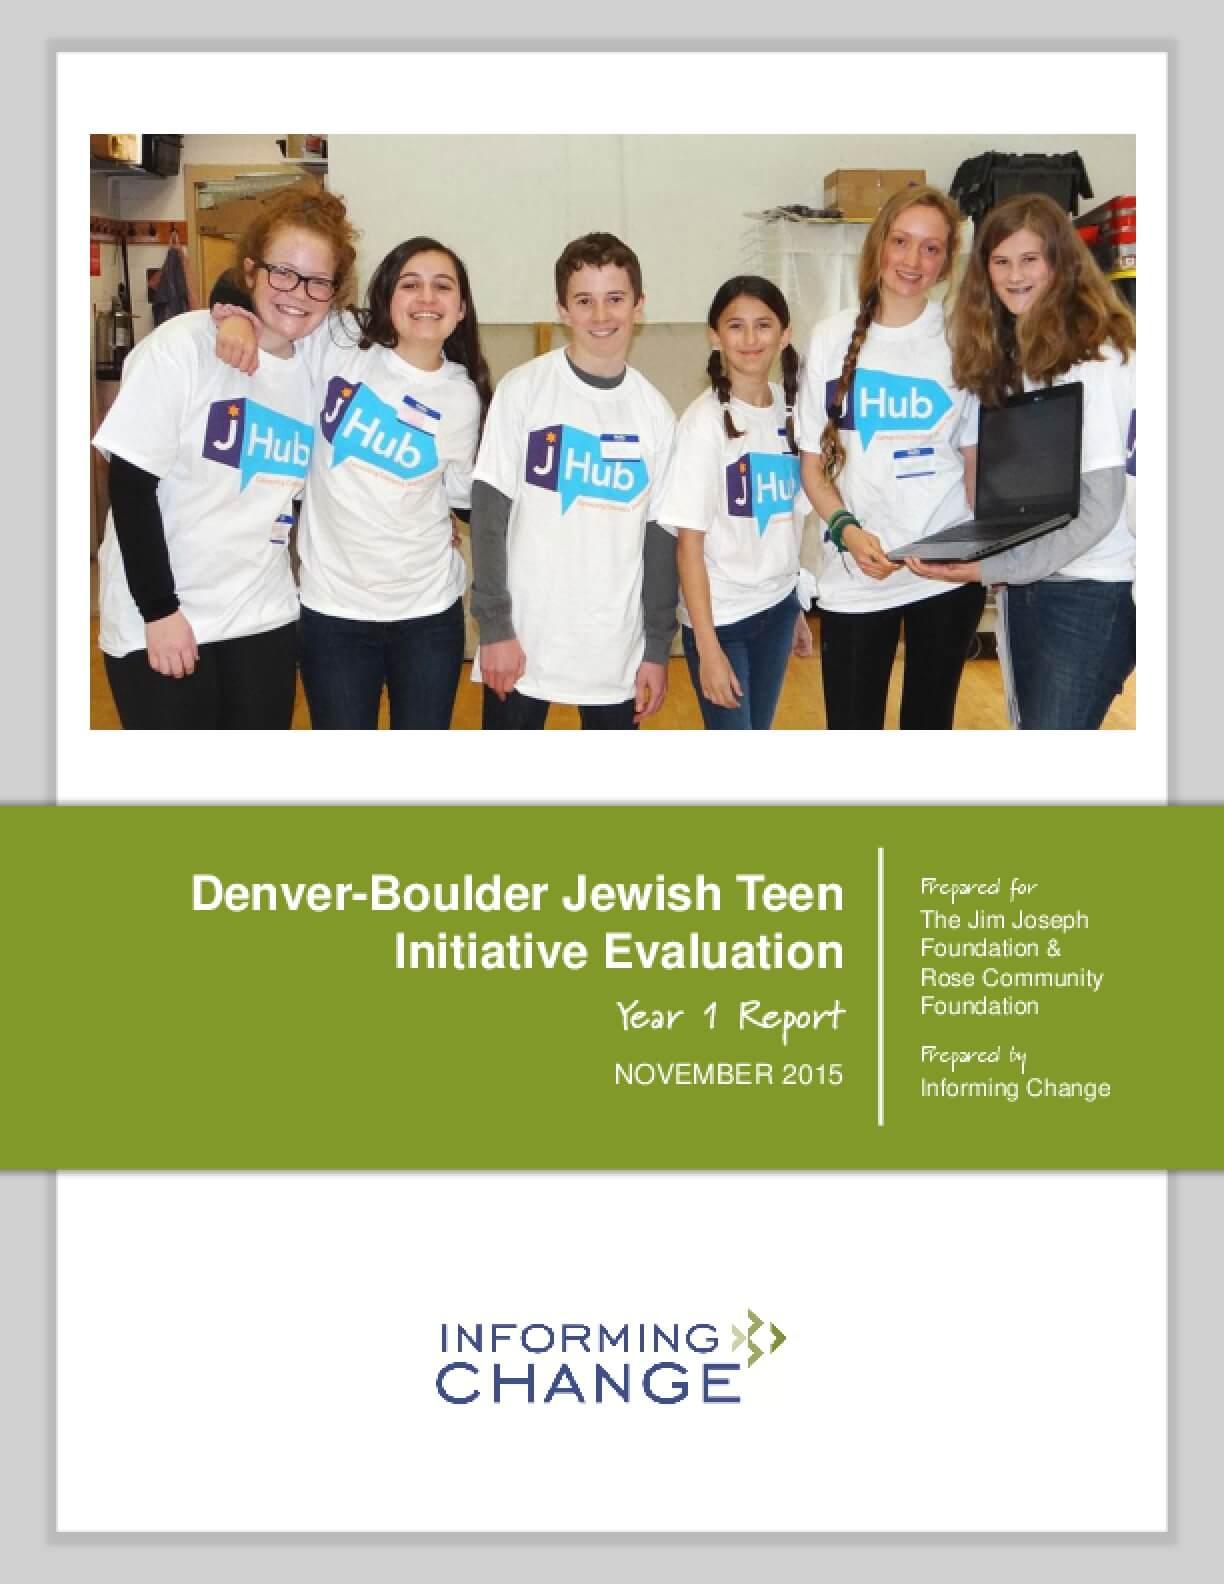 Denver-Boulder Jewish Teen Initiative Evaluation, Year 1 Report